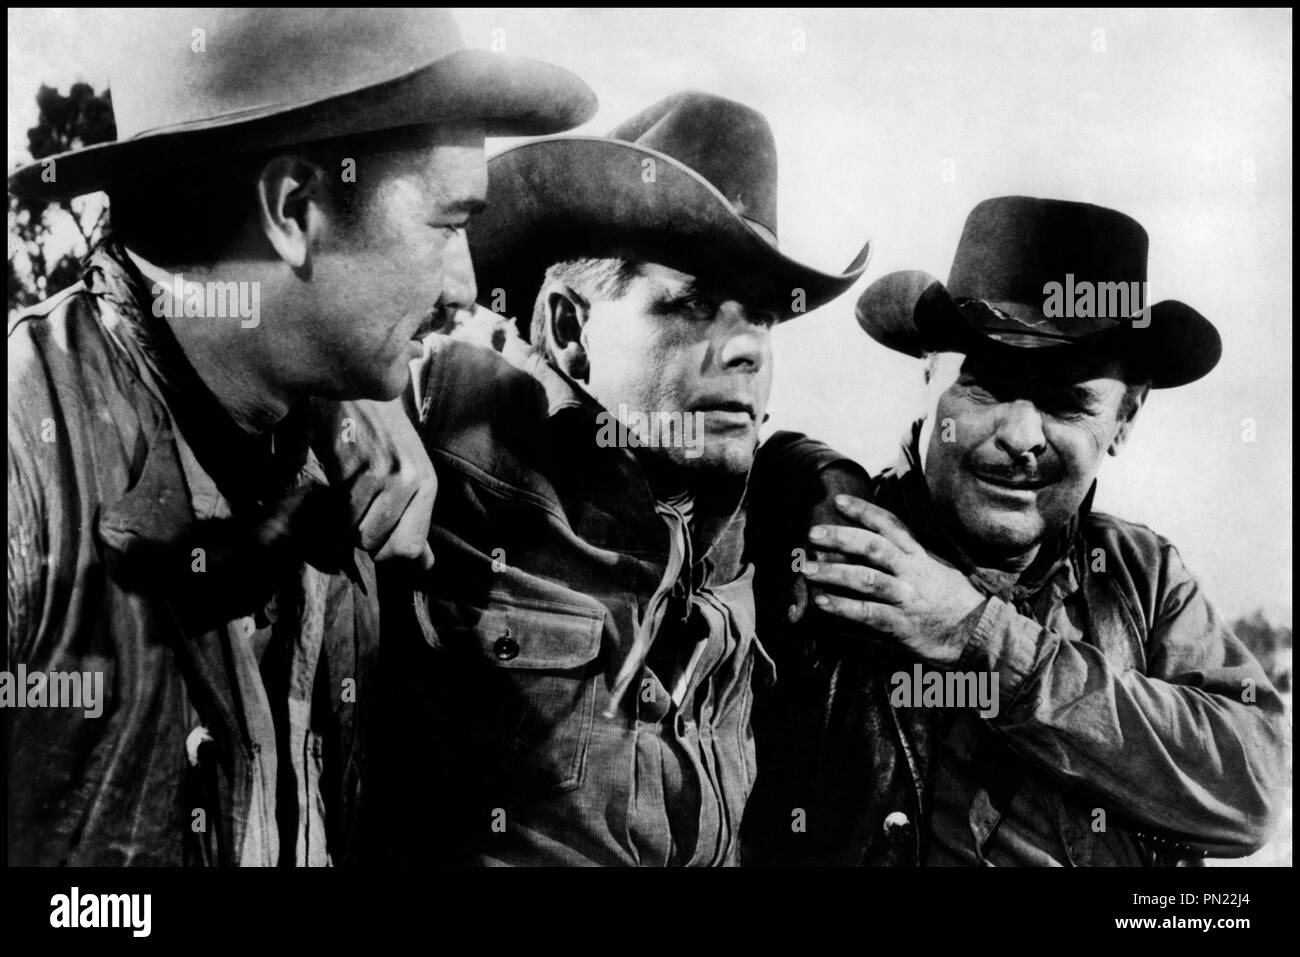 Prod DB © Phoenix/ DR COWBOY (COWBOY) de Delmer Daves 1958 USA avec Víctor Manuel Mendoza, Glenn Ford et Brian Donlevy western d'apres le roman de Frank Harris - Stock Image